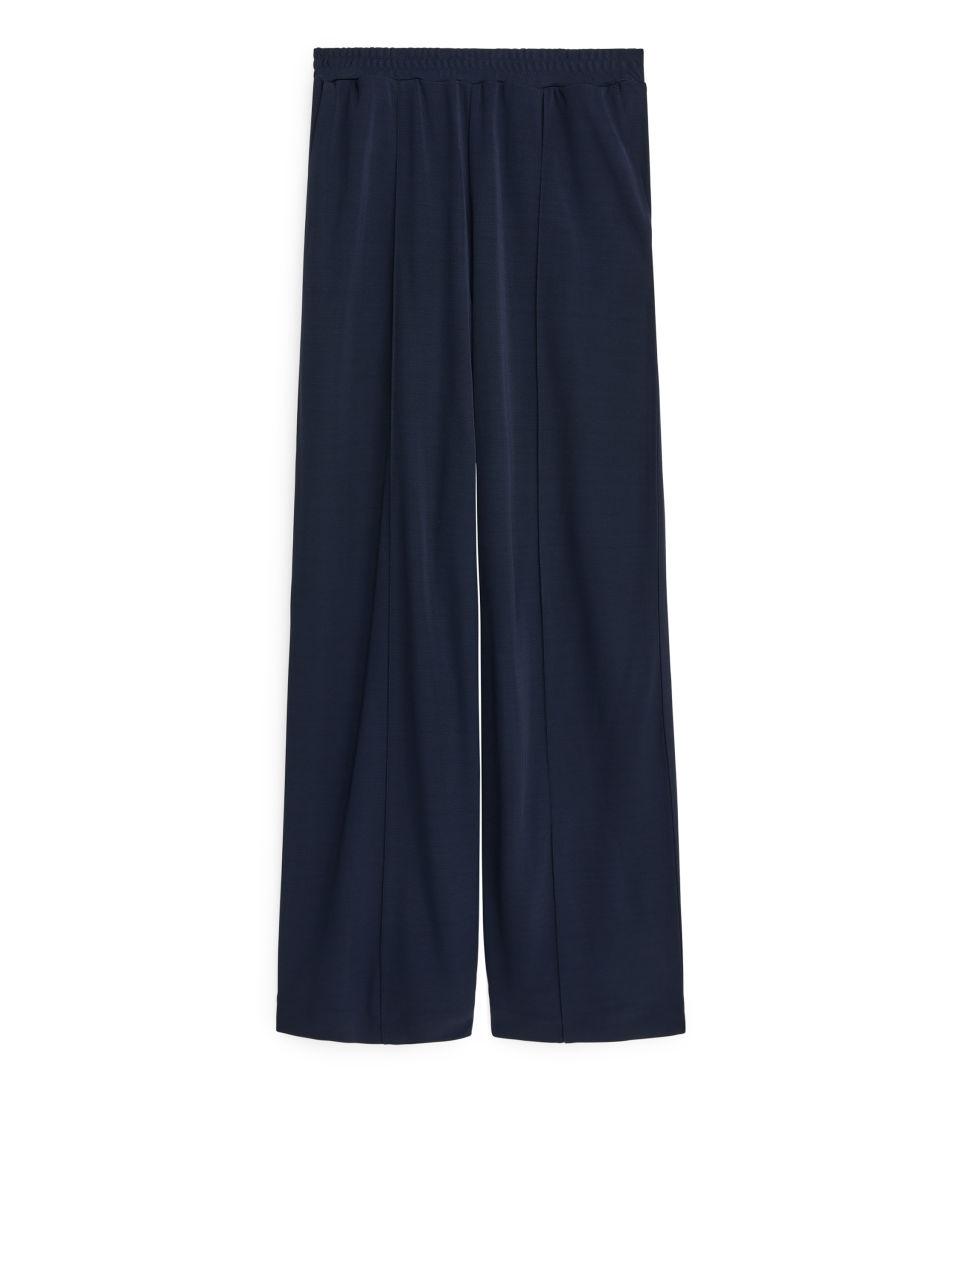 Viscose Trousers - Blue